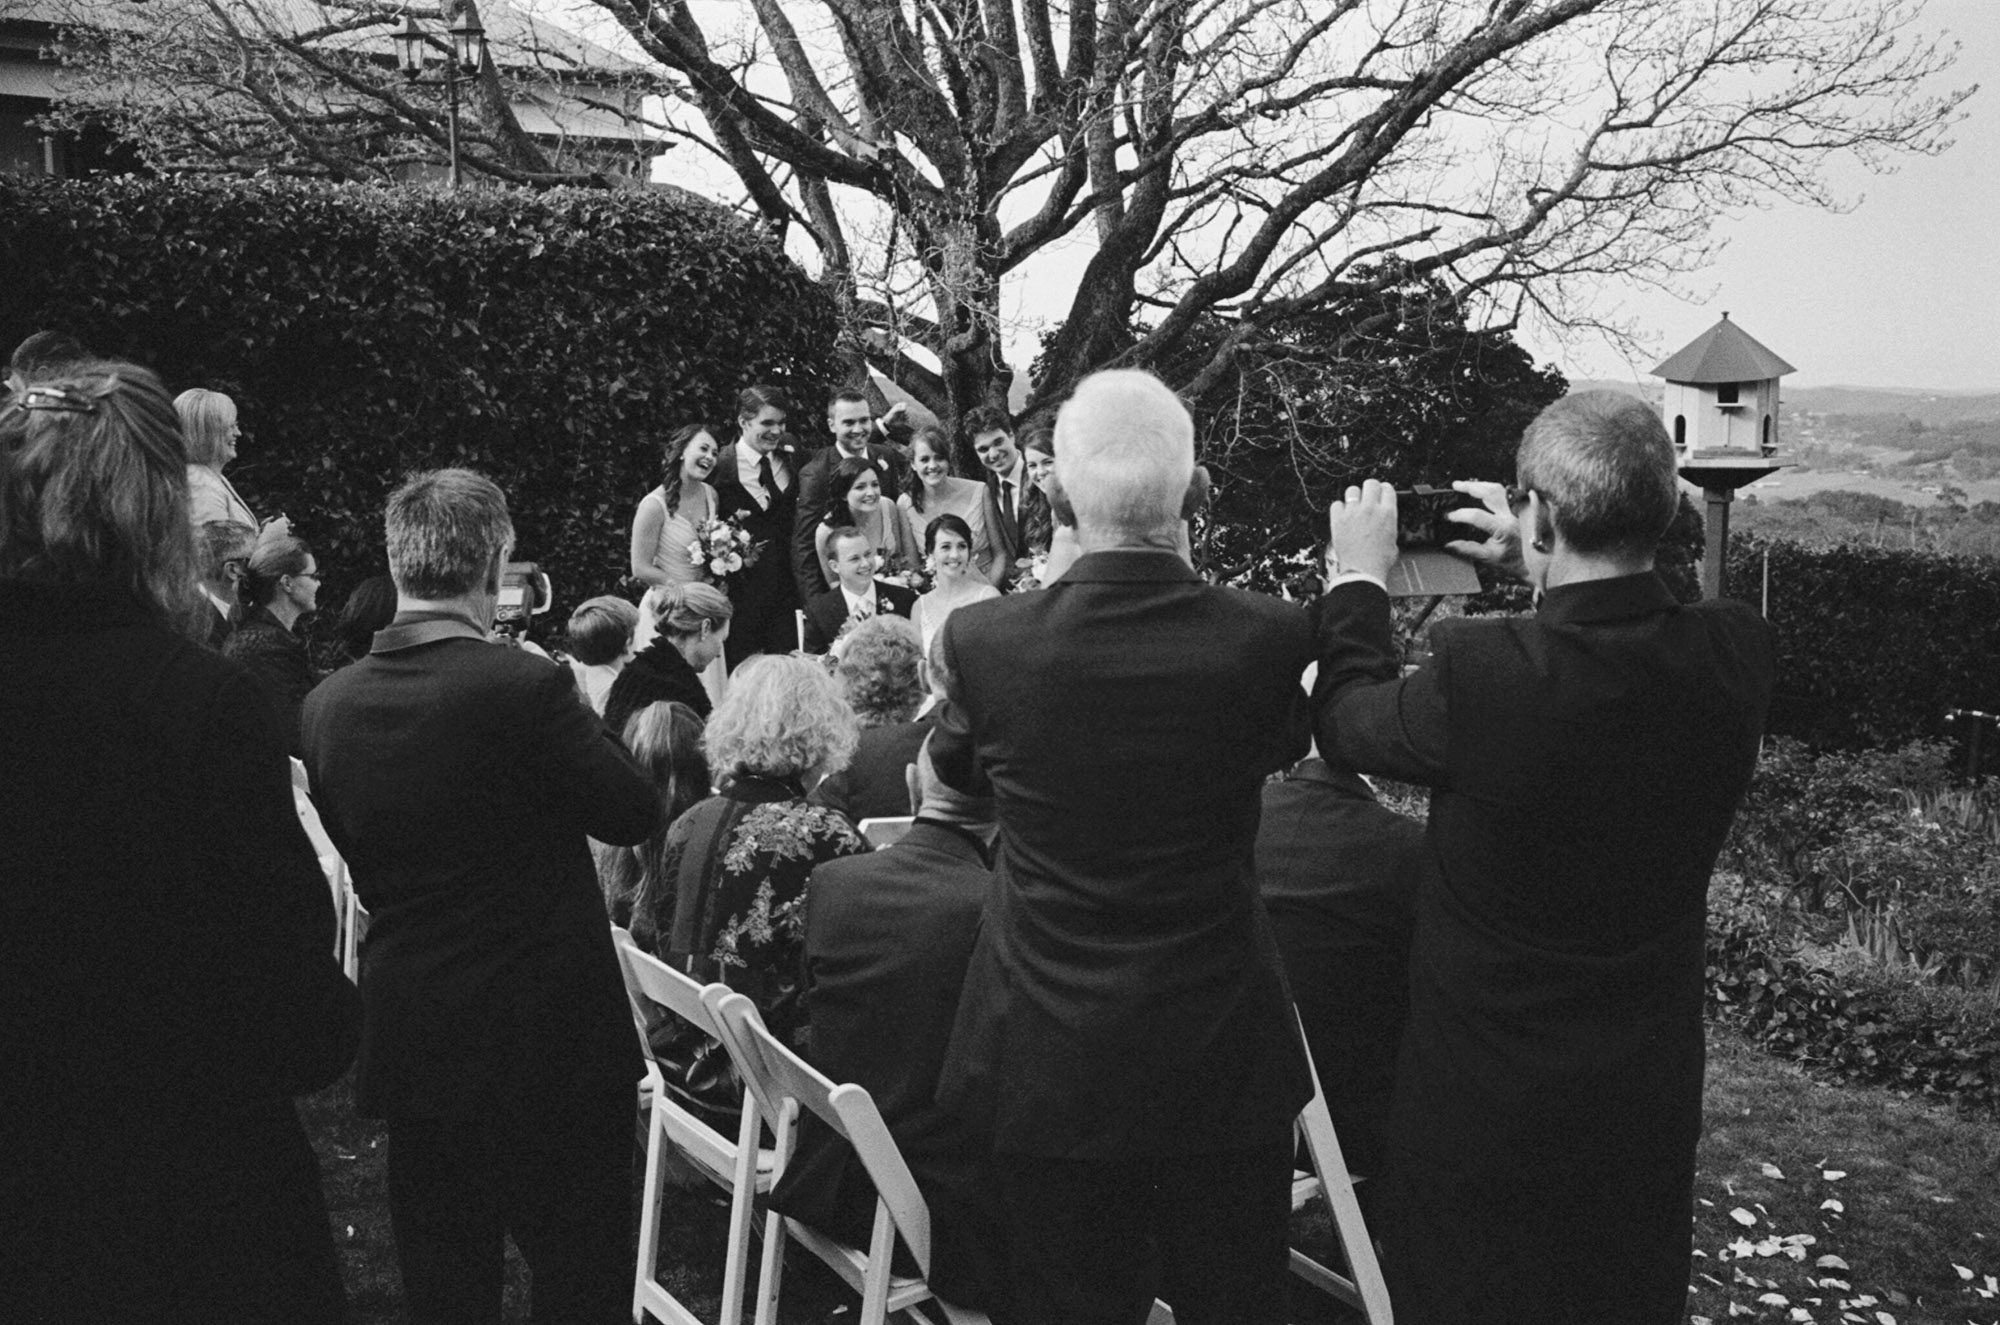 Mount-Lofty-House-wedding-photography-054.jpg